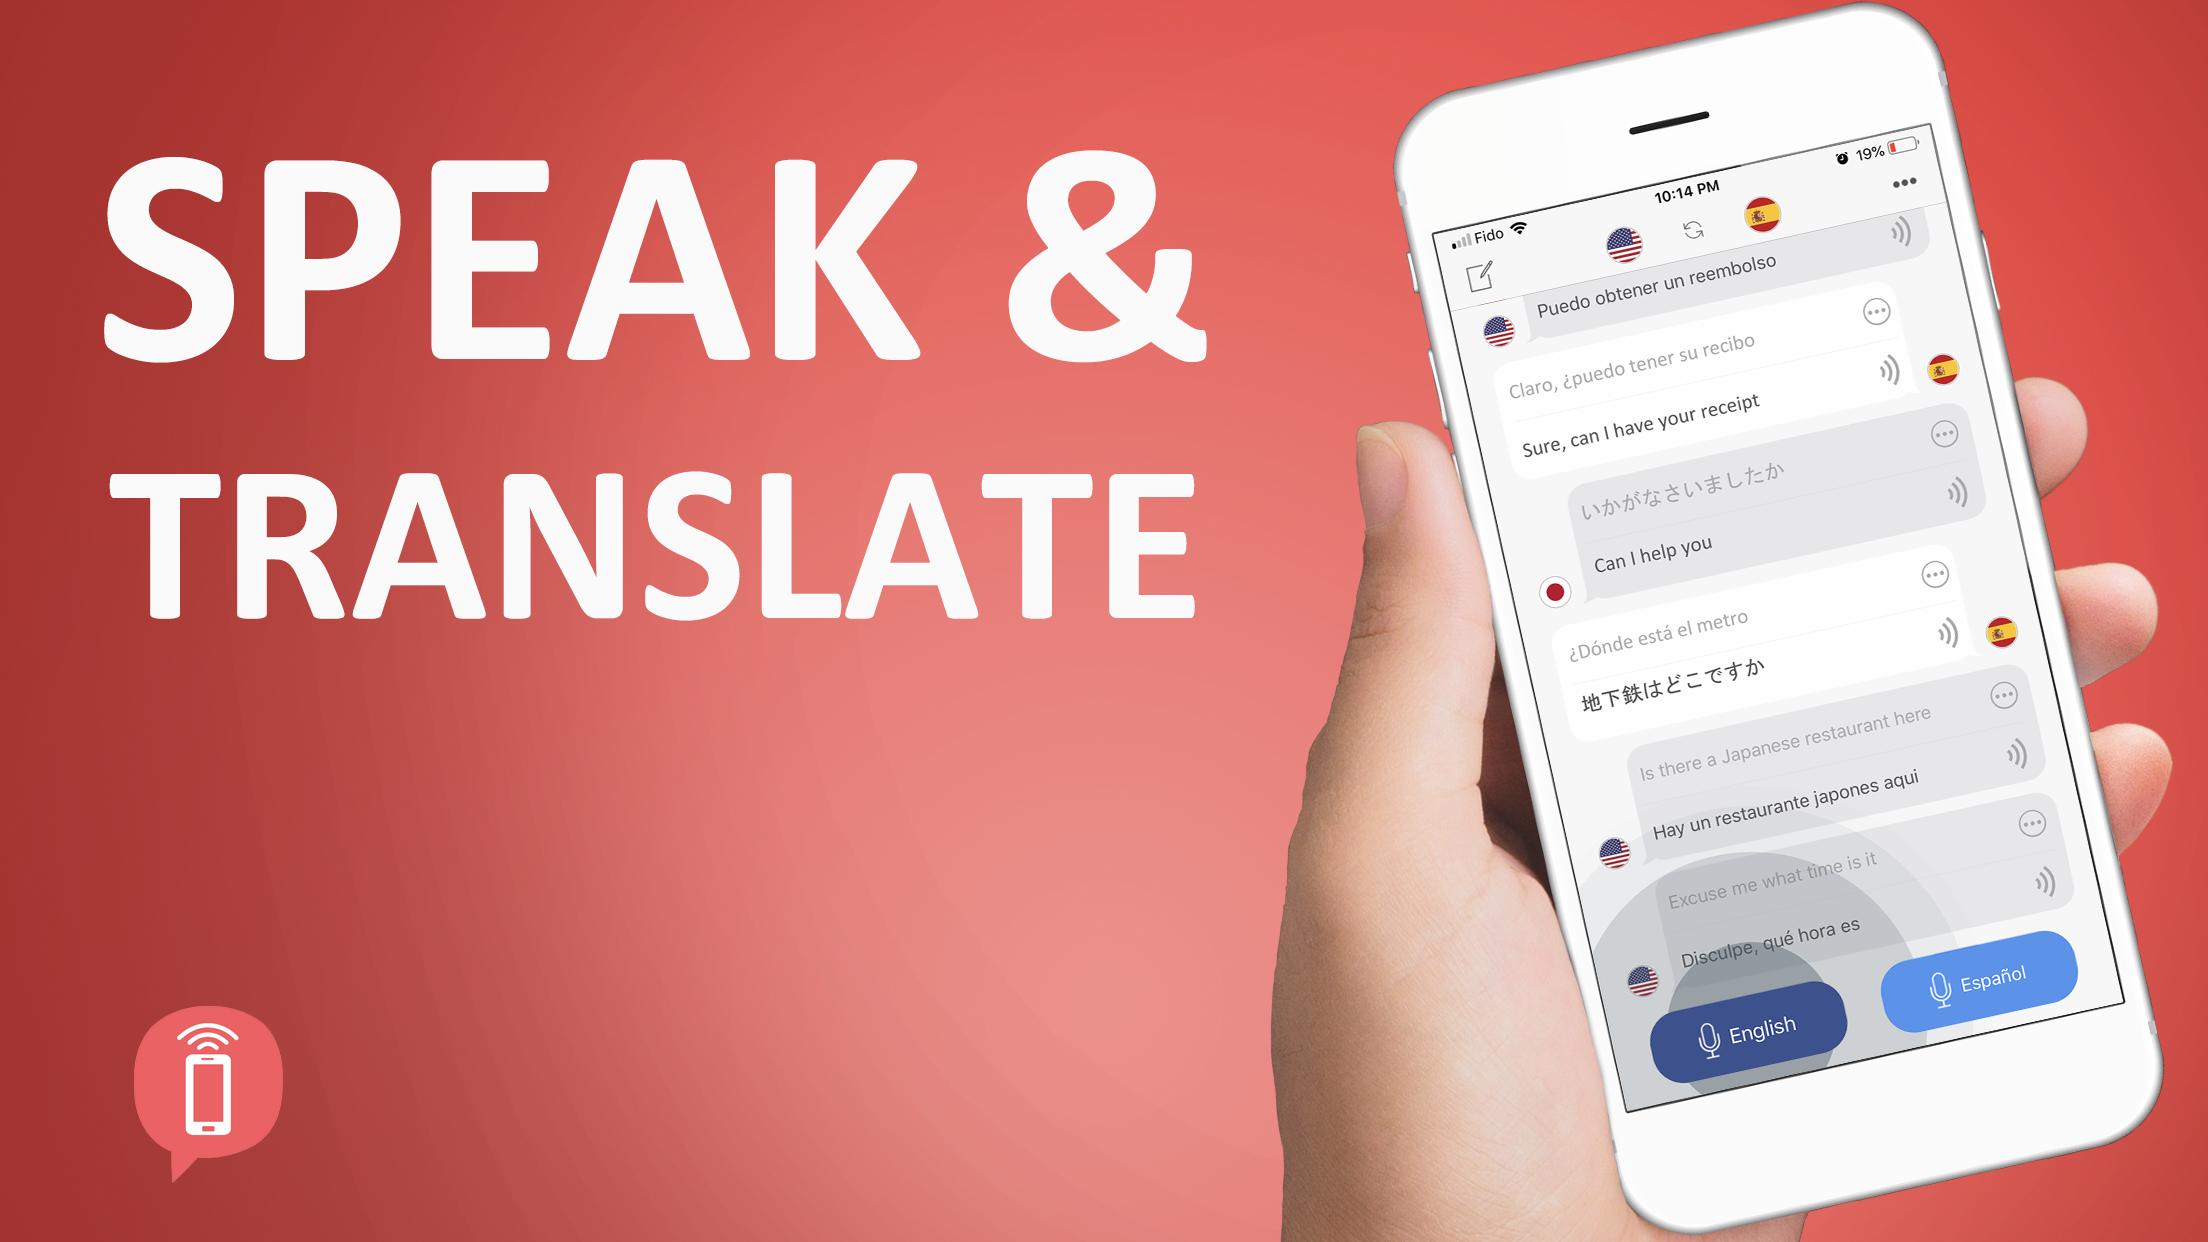 Voice Translator Alive on AppStore Translation, The